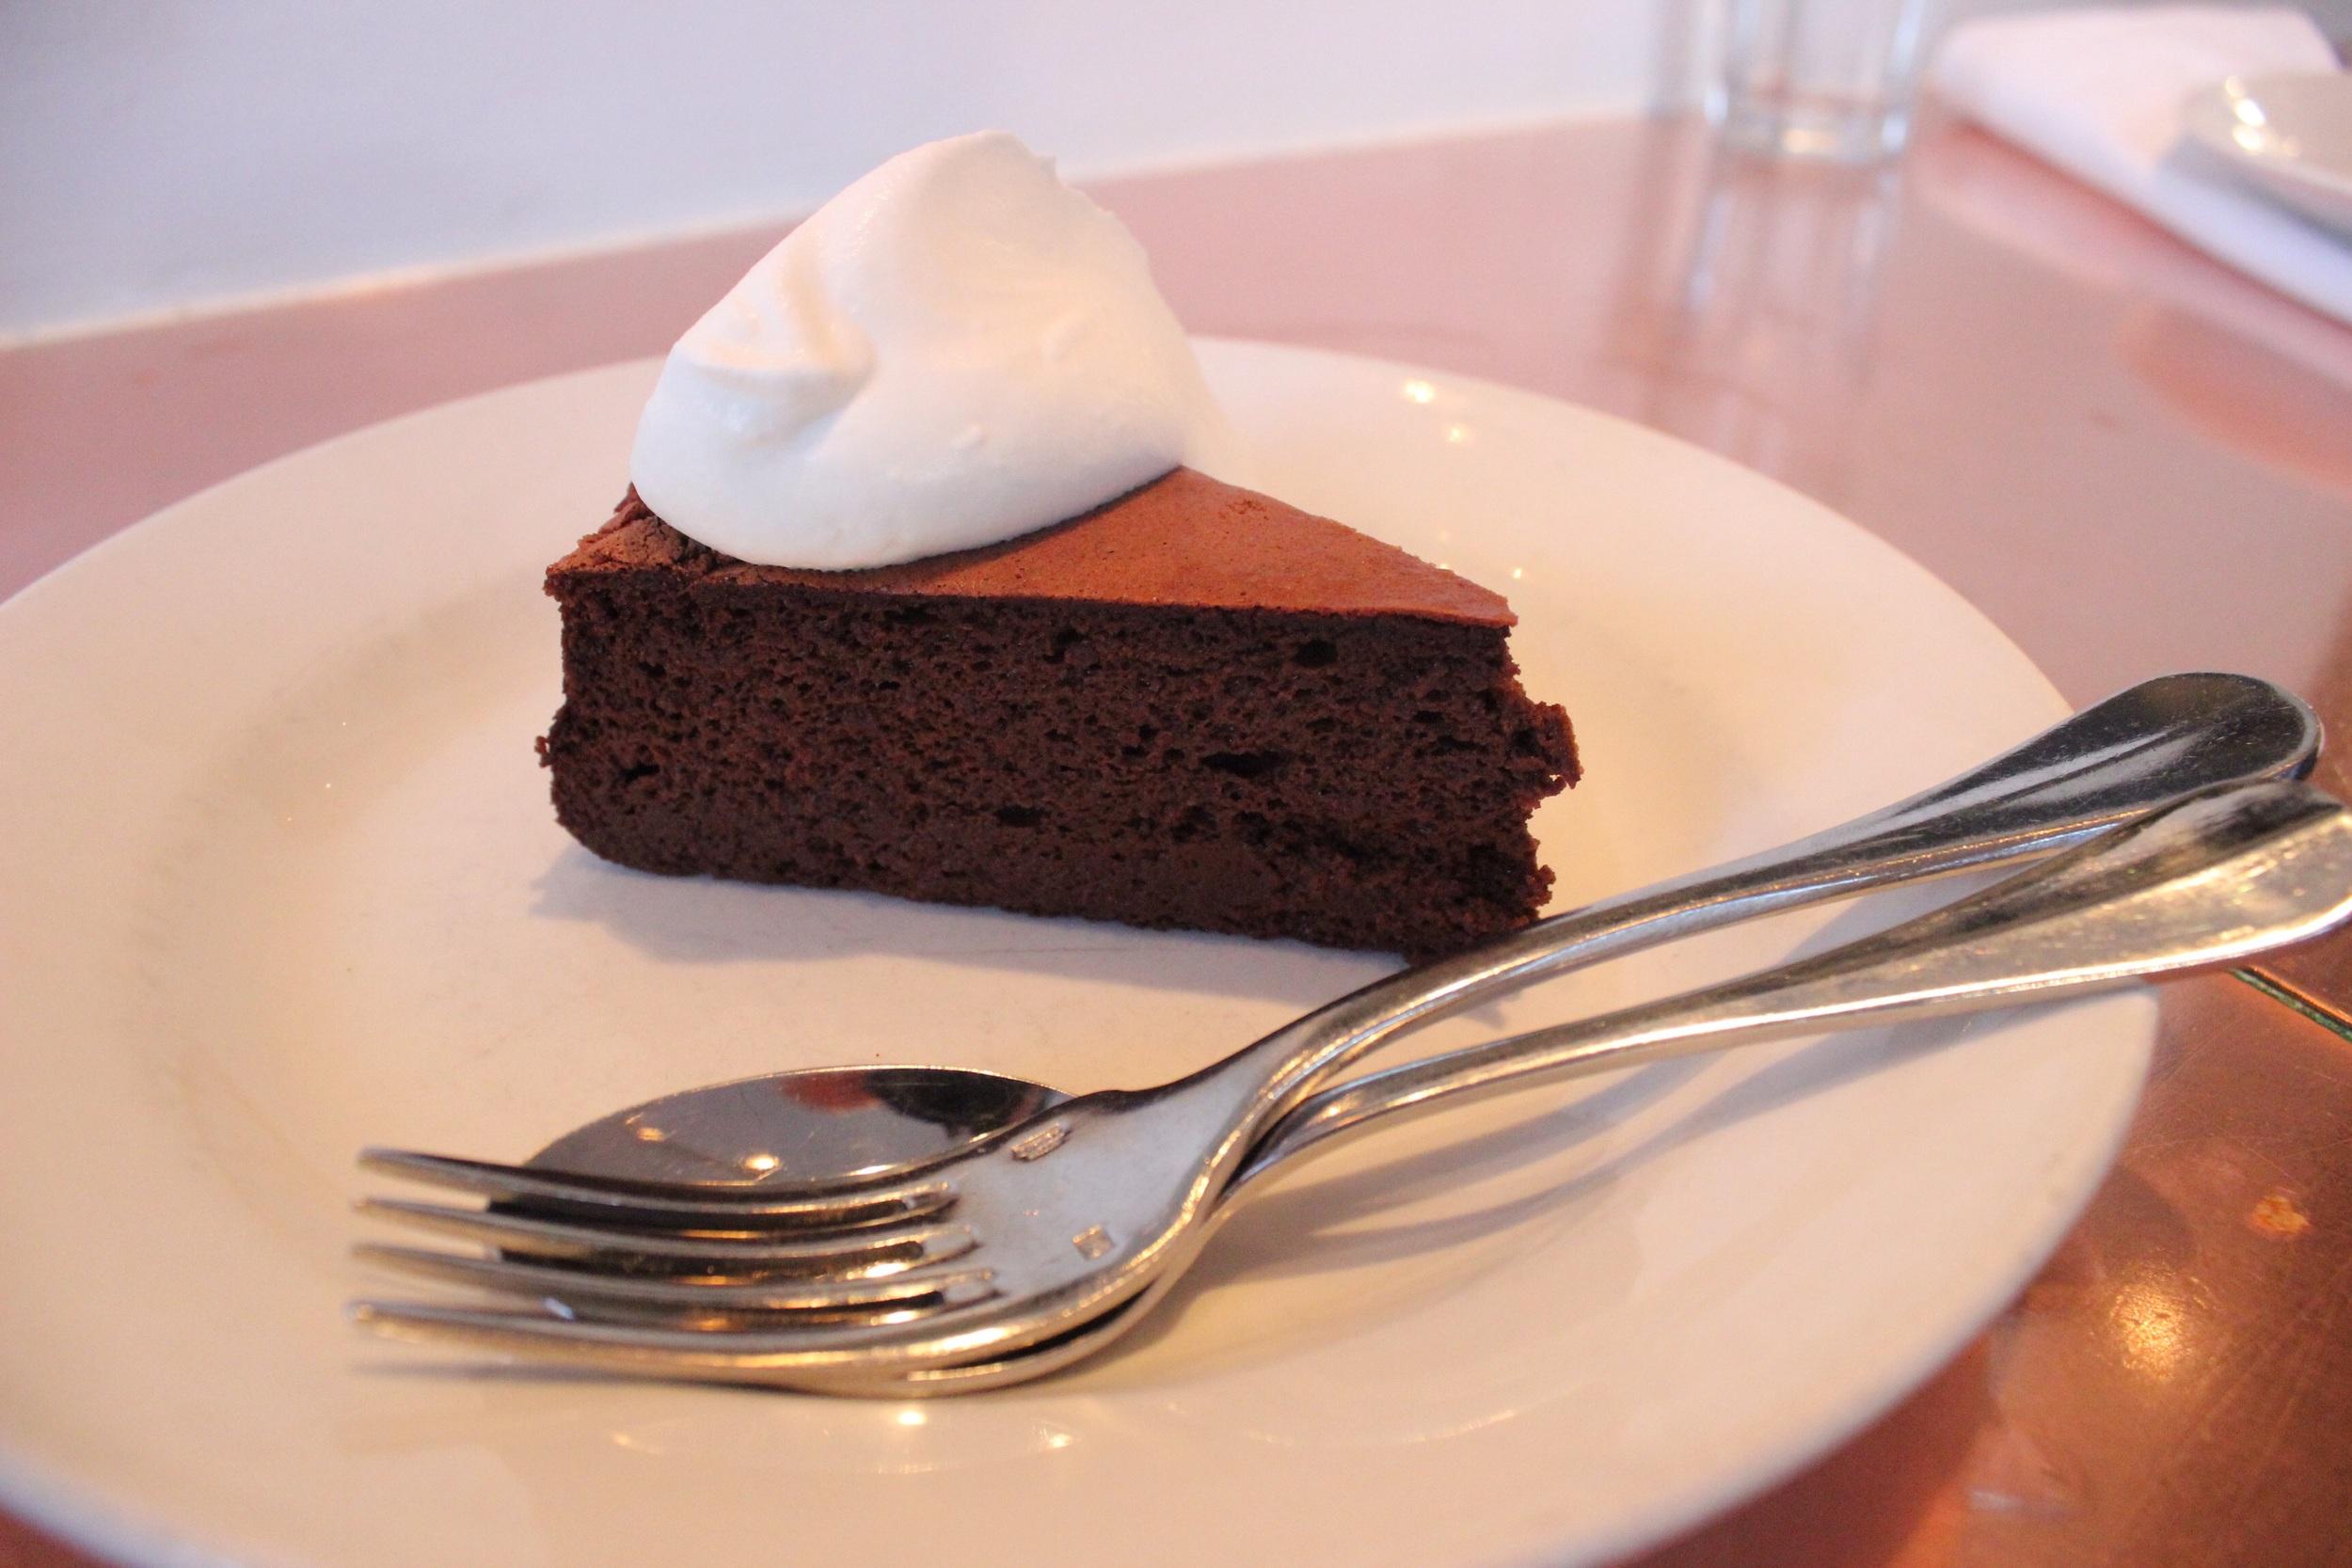 'Praise this cake ladies and gentlemen'